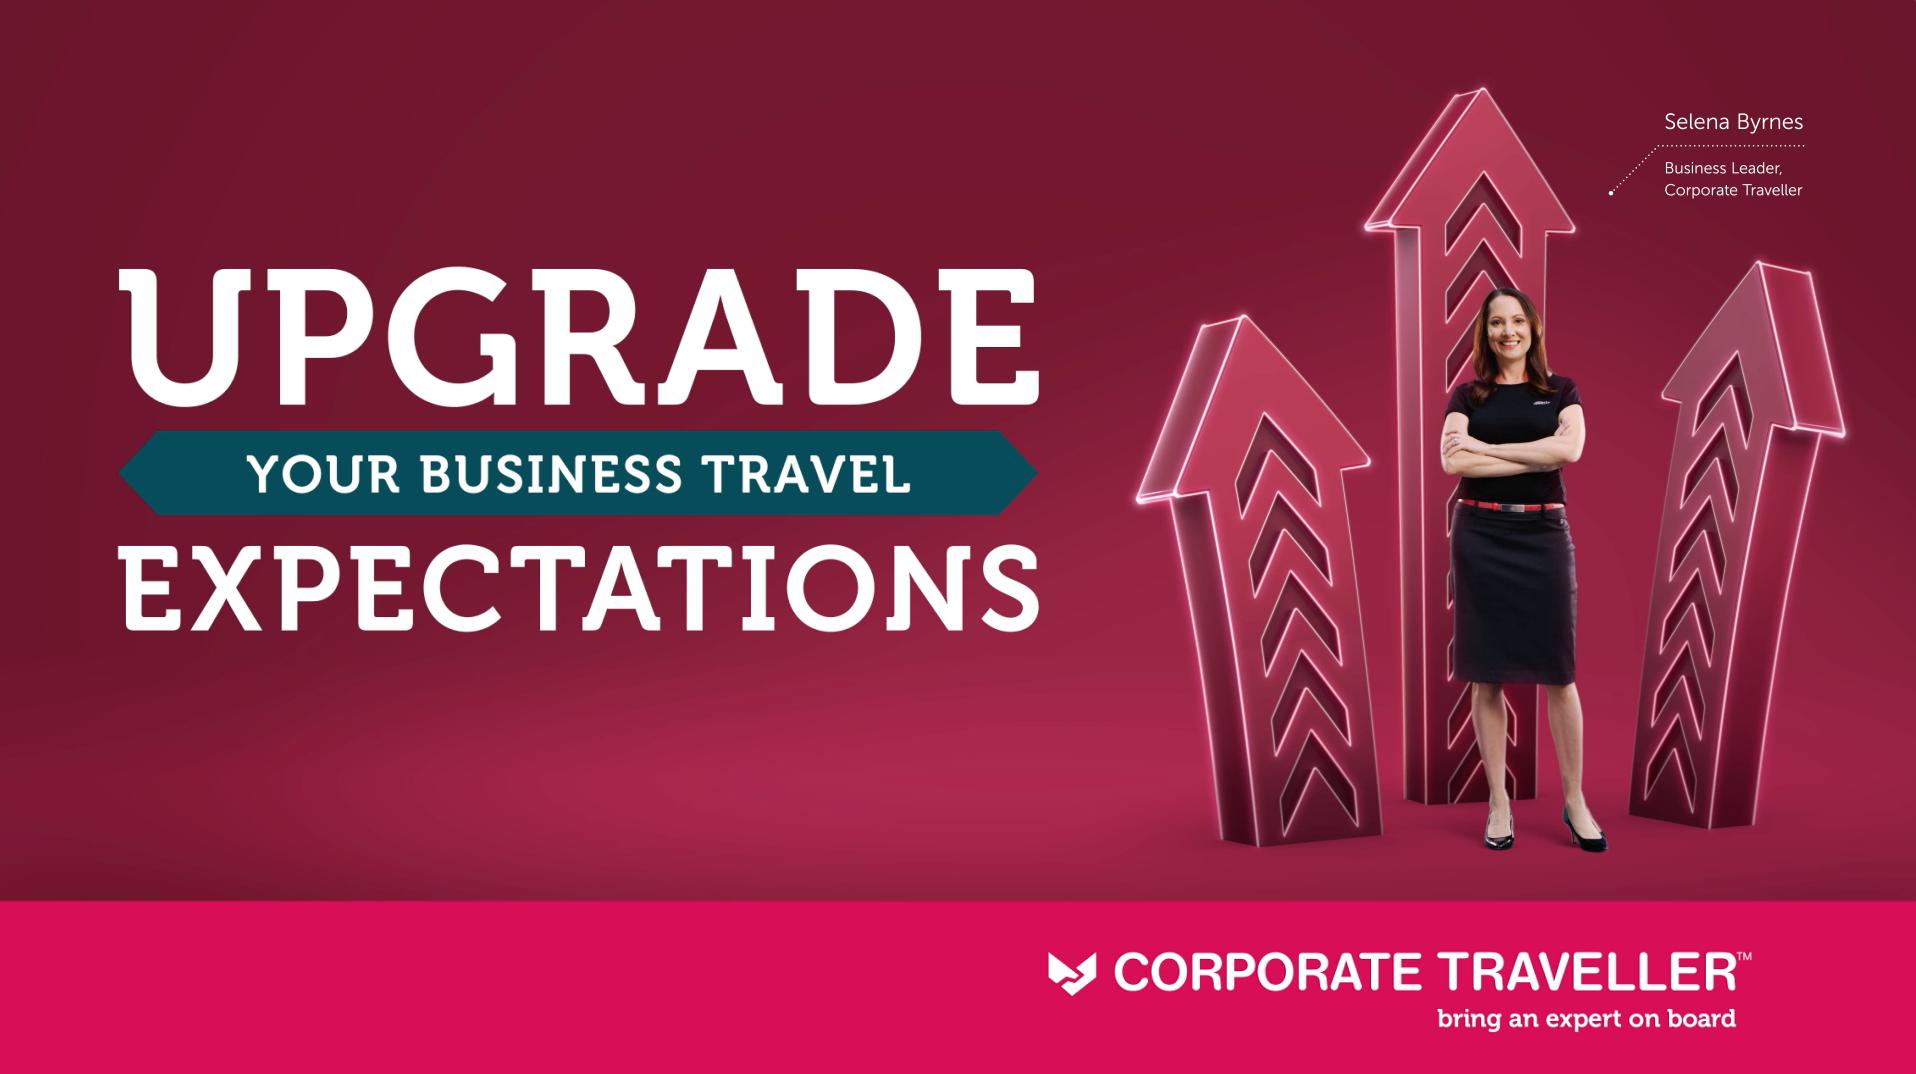 Corporate Traveller Brand